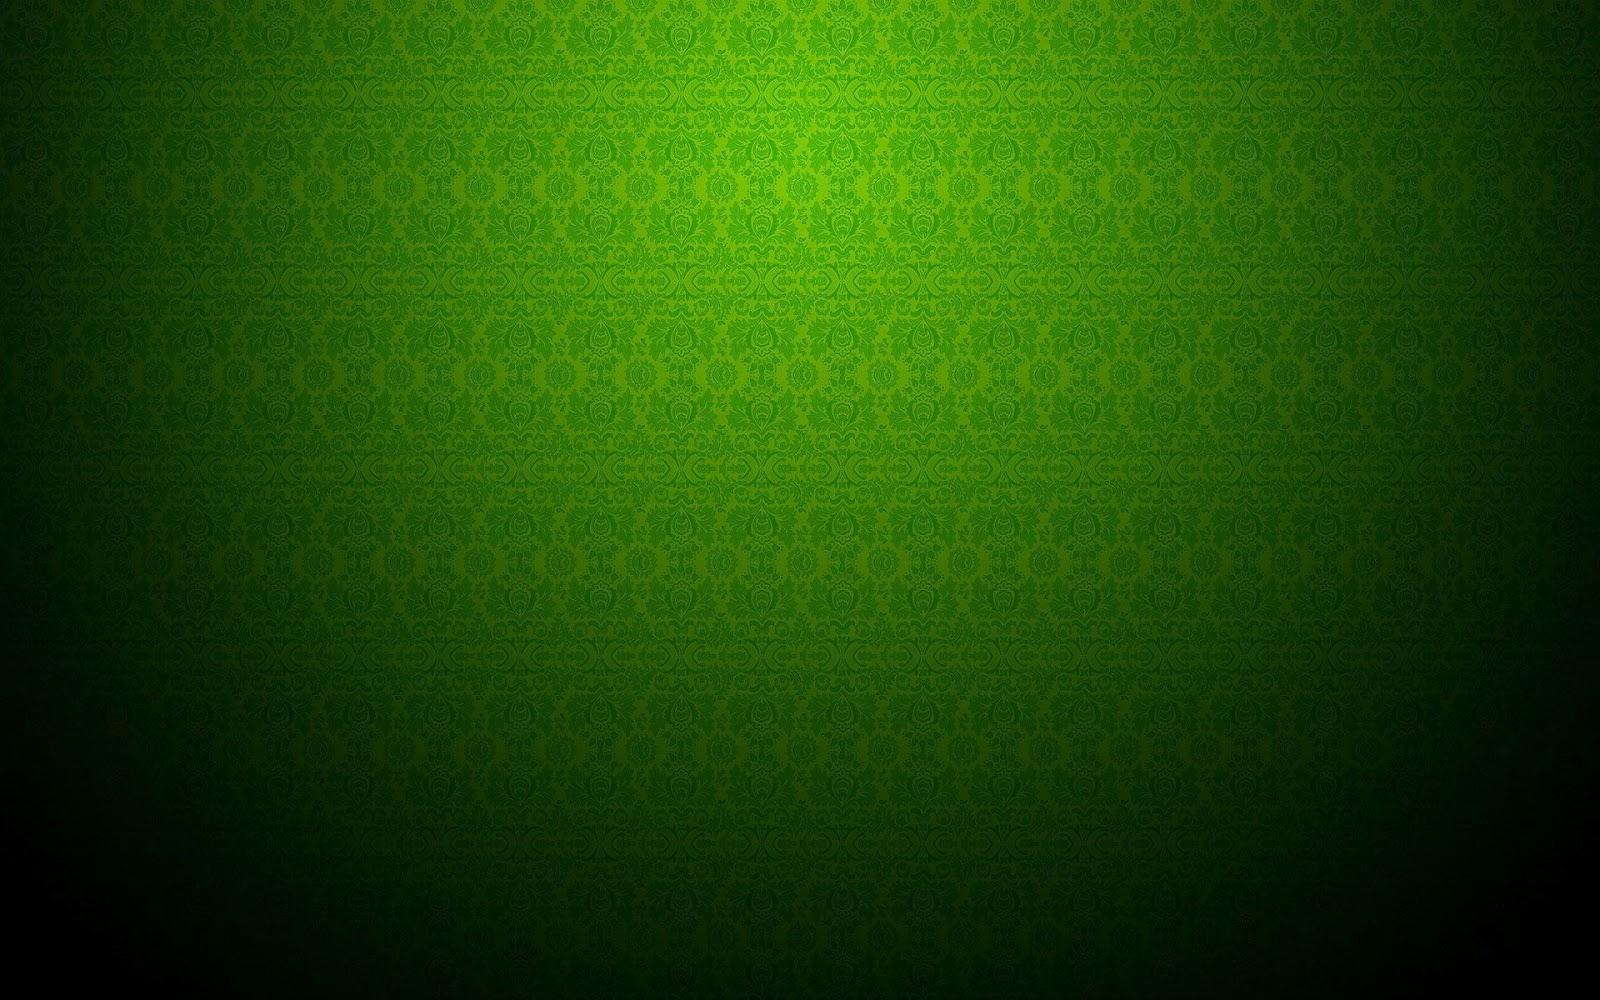 Table Next To Bed Mooie Groene Achtergronden Hd Leuke Groene Wallpapers